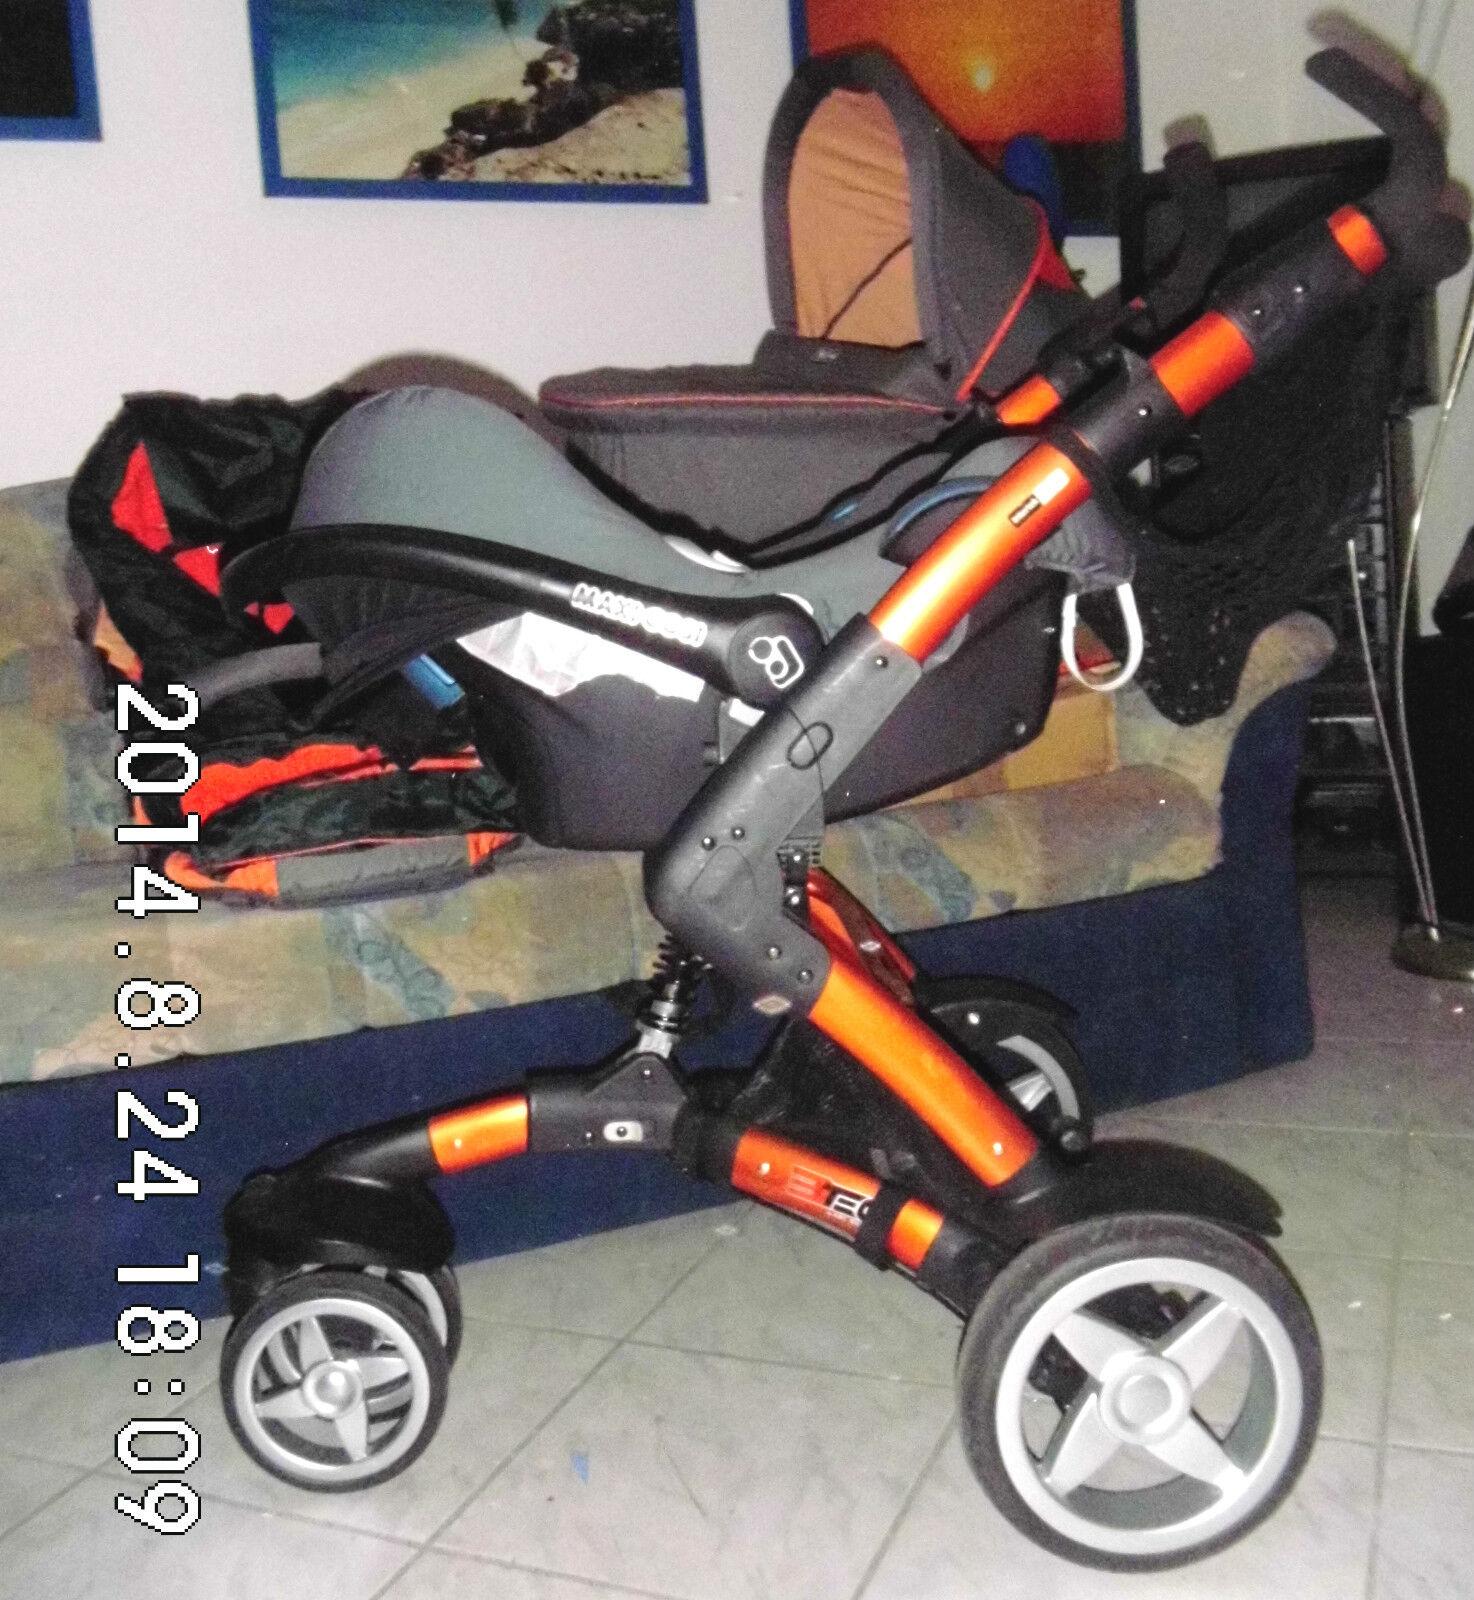 abc design 3 tec kinderwagen maxi cosi babyschale buggy wintersack sonnensc eur 499 00. Black Bedroom Furniture Sets. Home Design Ideas